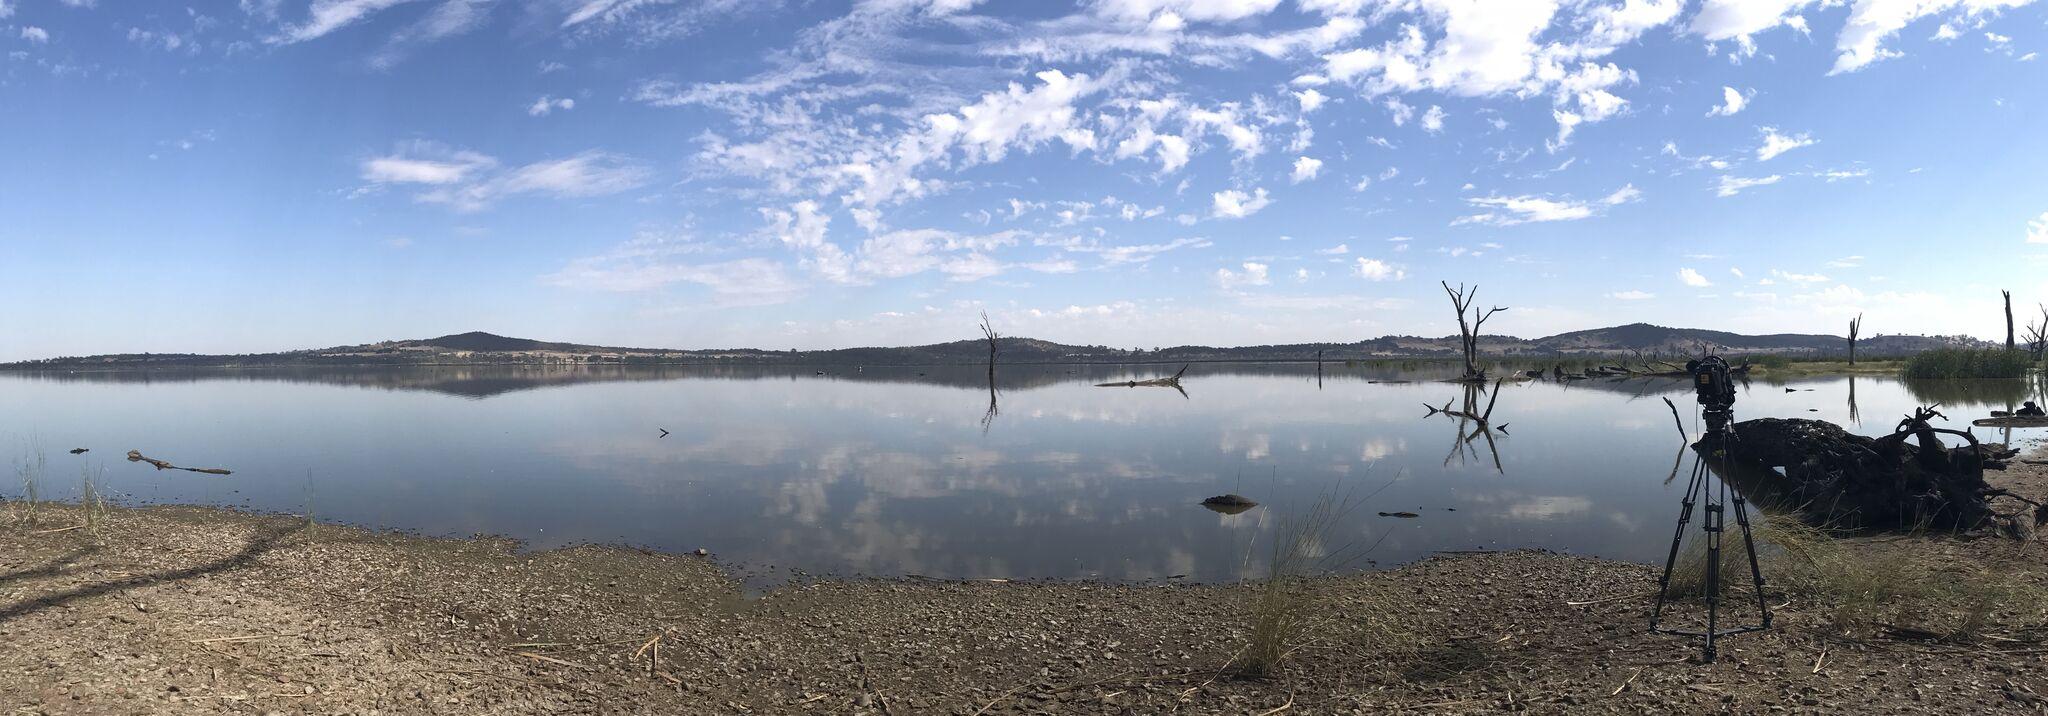 Water at Lake Mokoan